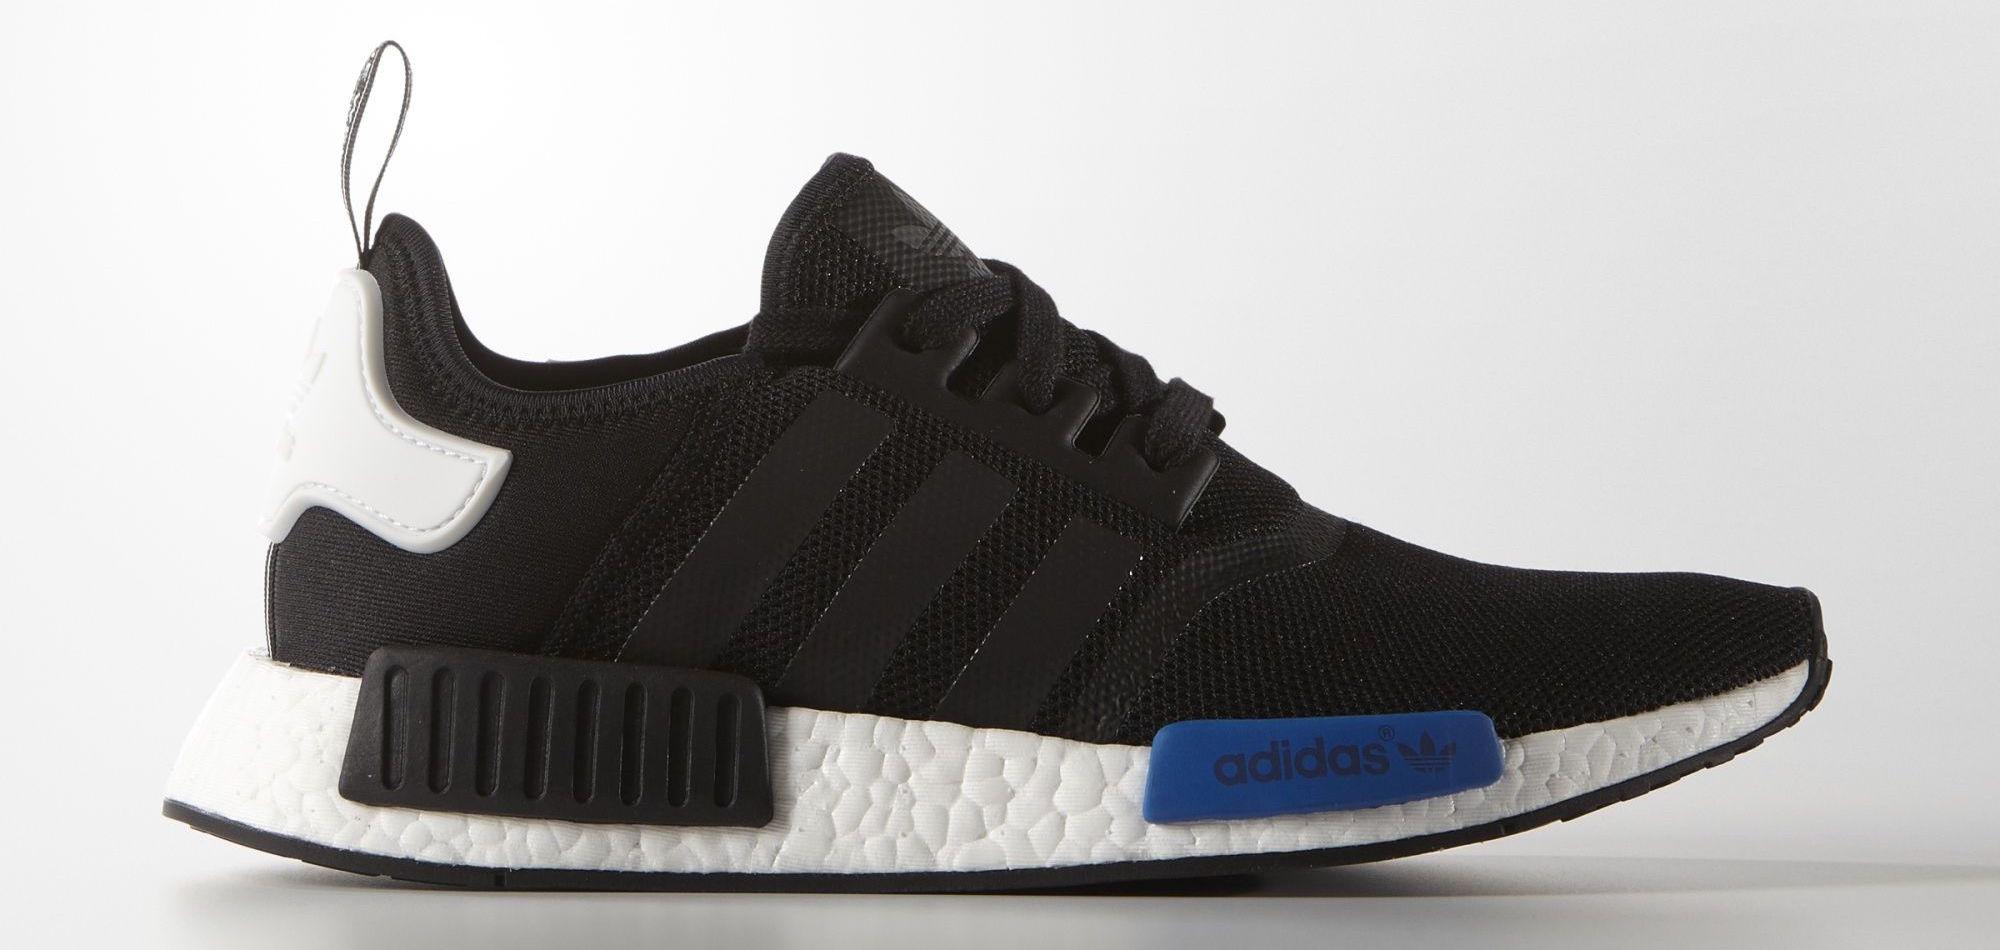 44b27cac21a8f ... order adidas nmd runner r1 core black blue 490c5 8e68b